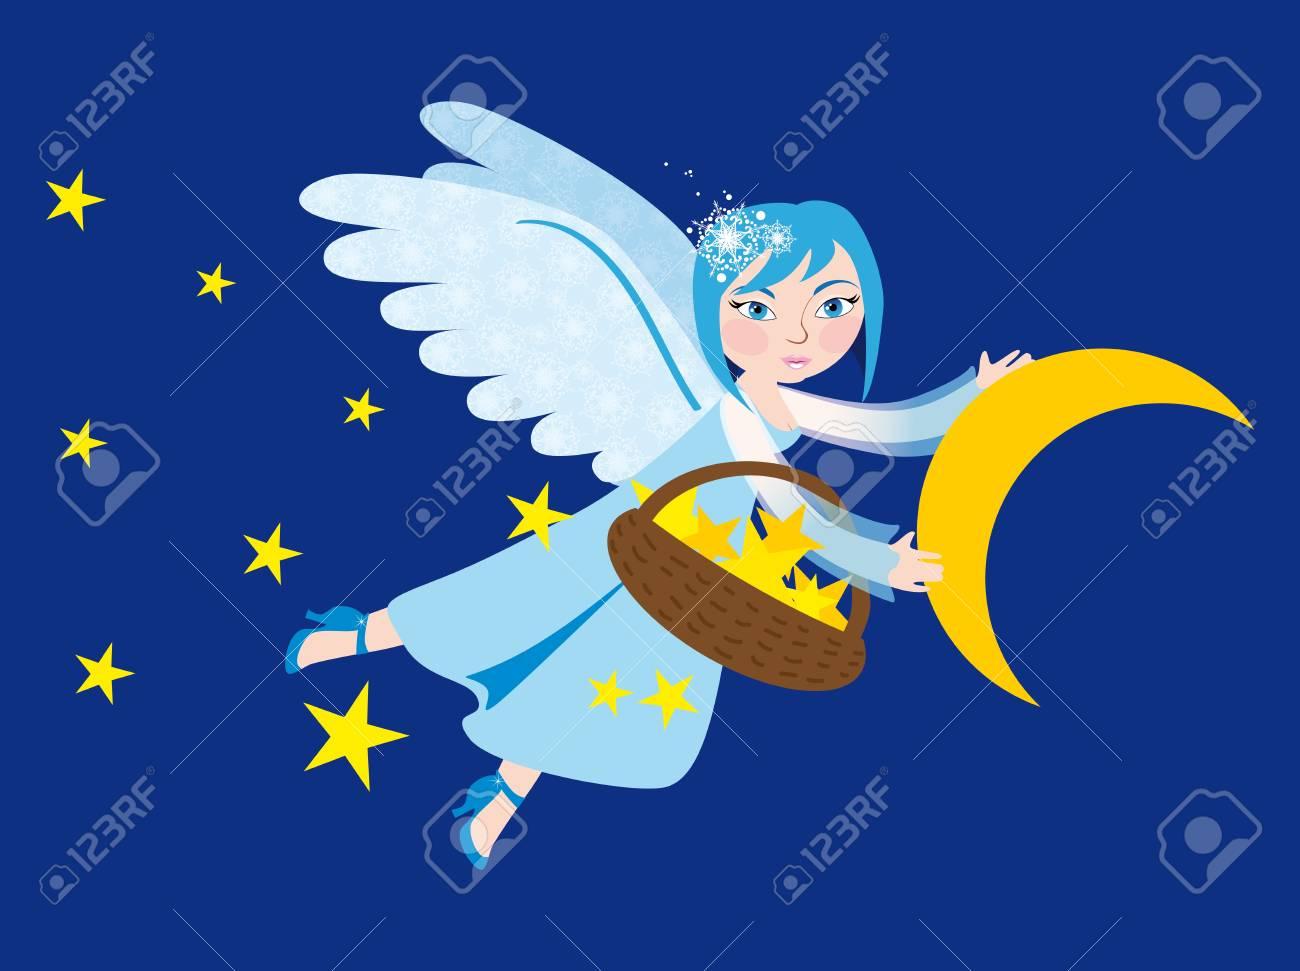 Snow angel Stock Vector - 15789126